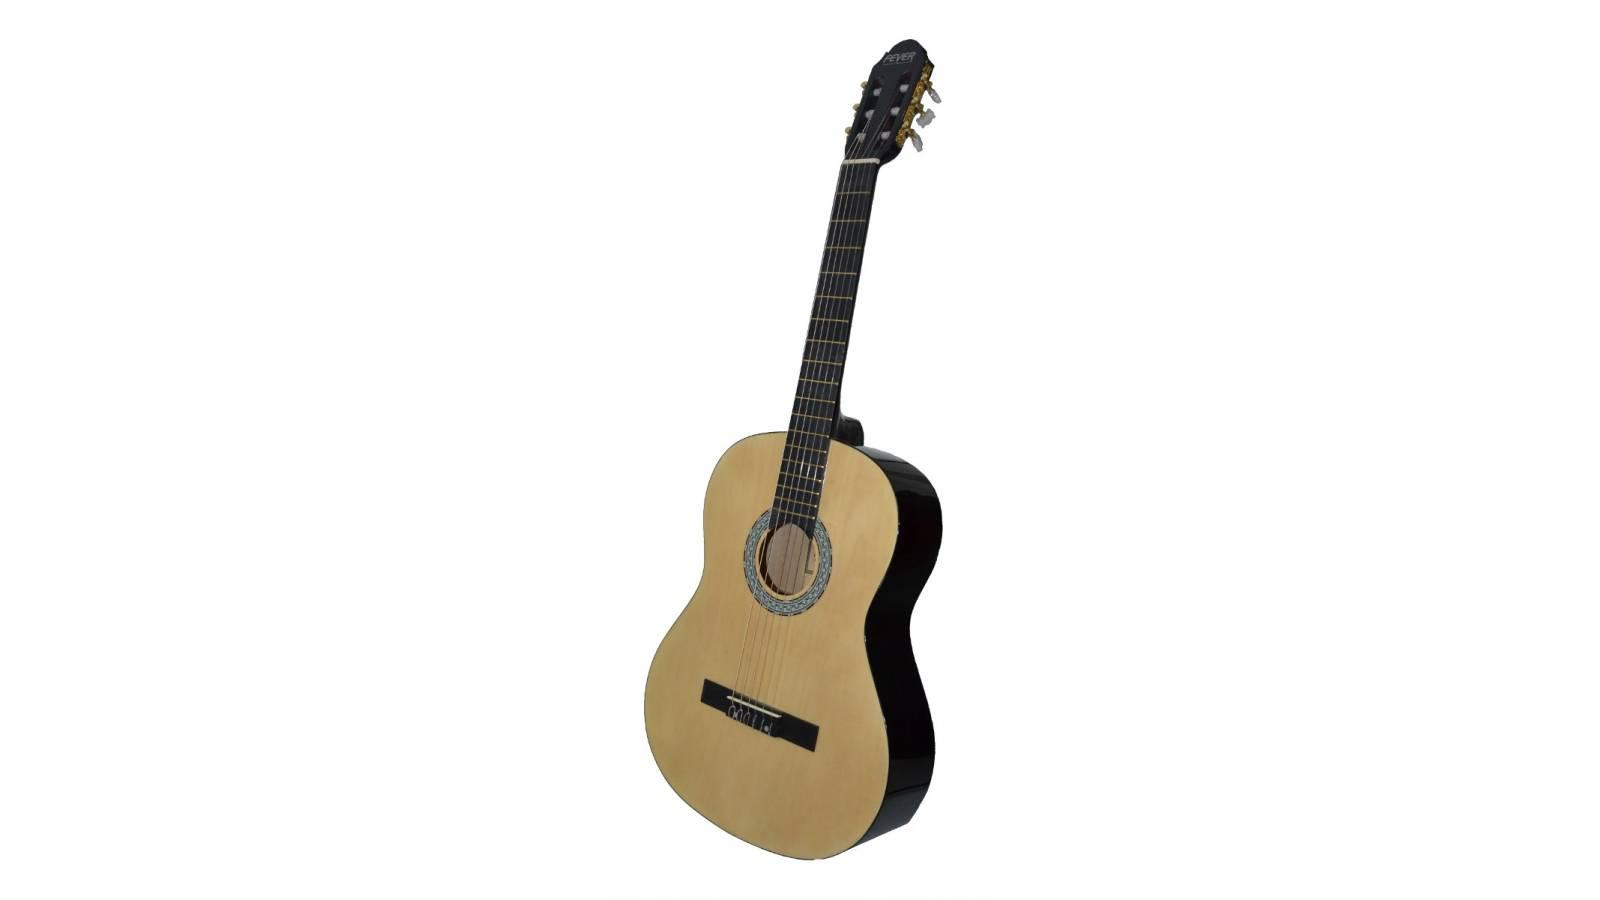 Guitarra Criolla Clásica Fever Variedad De Colores